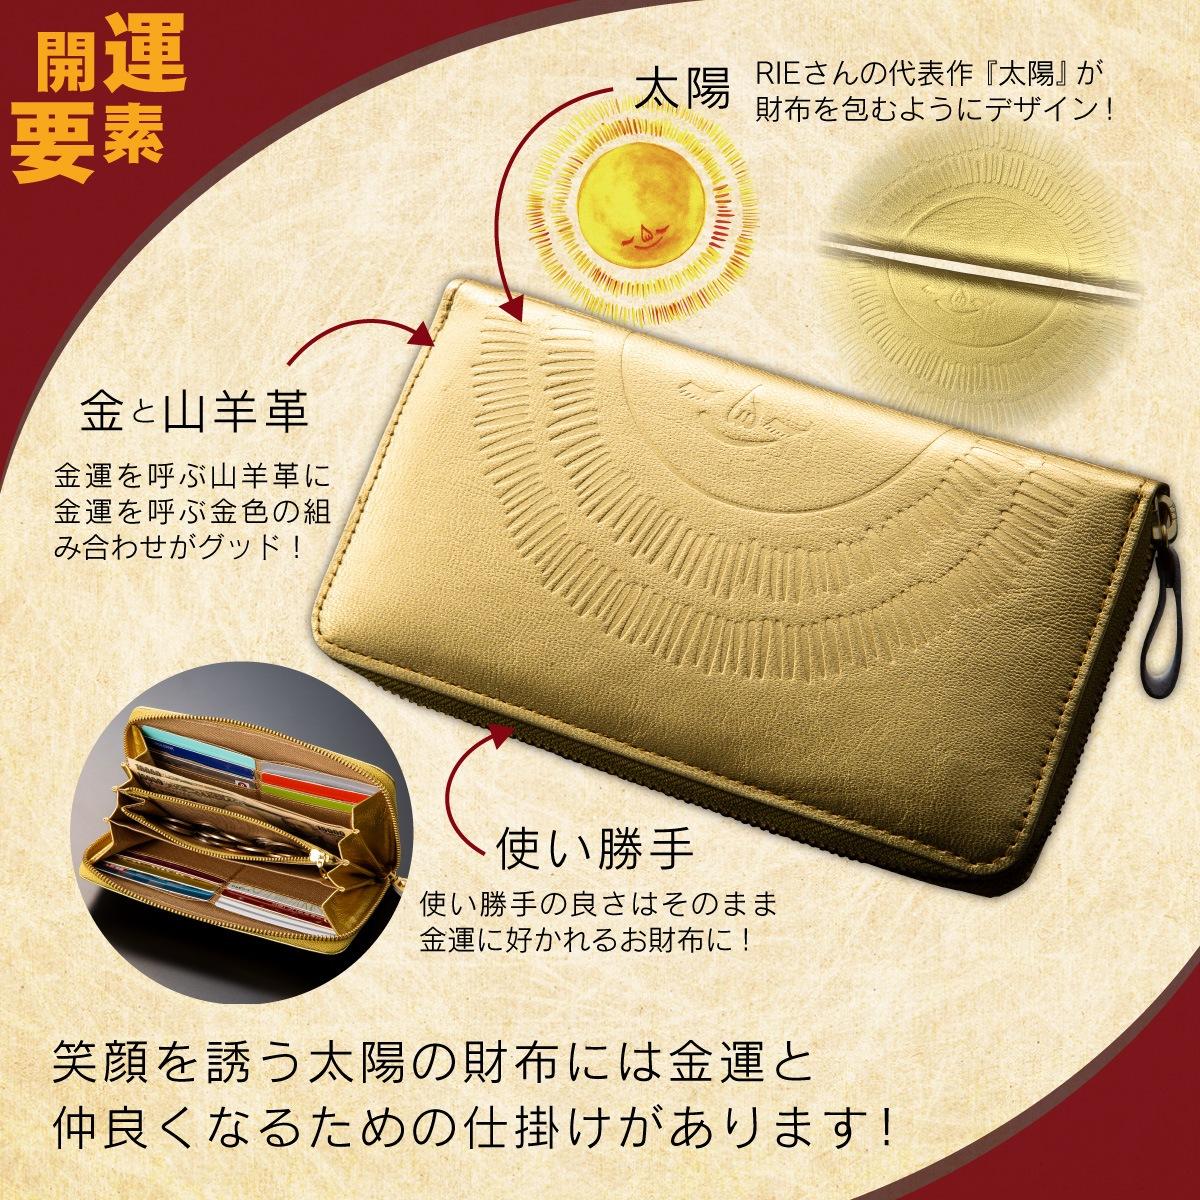 RIEの『太陽の金運財布ラウンド』